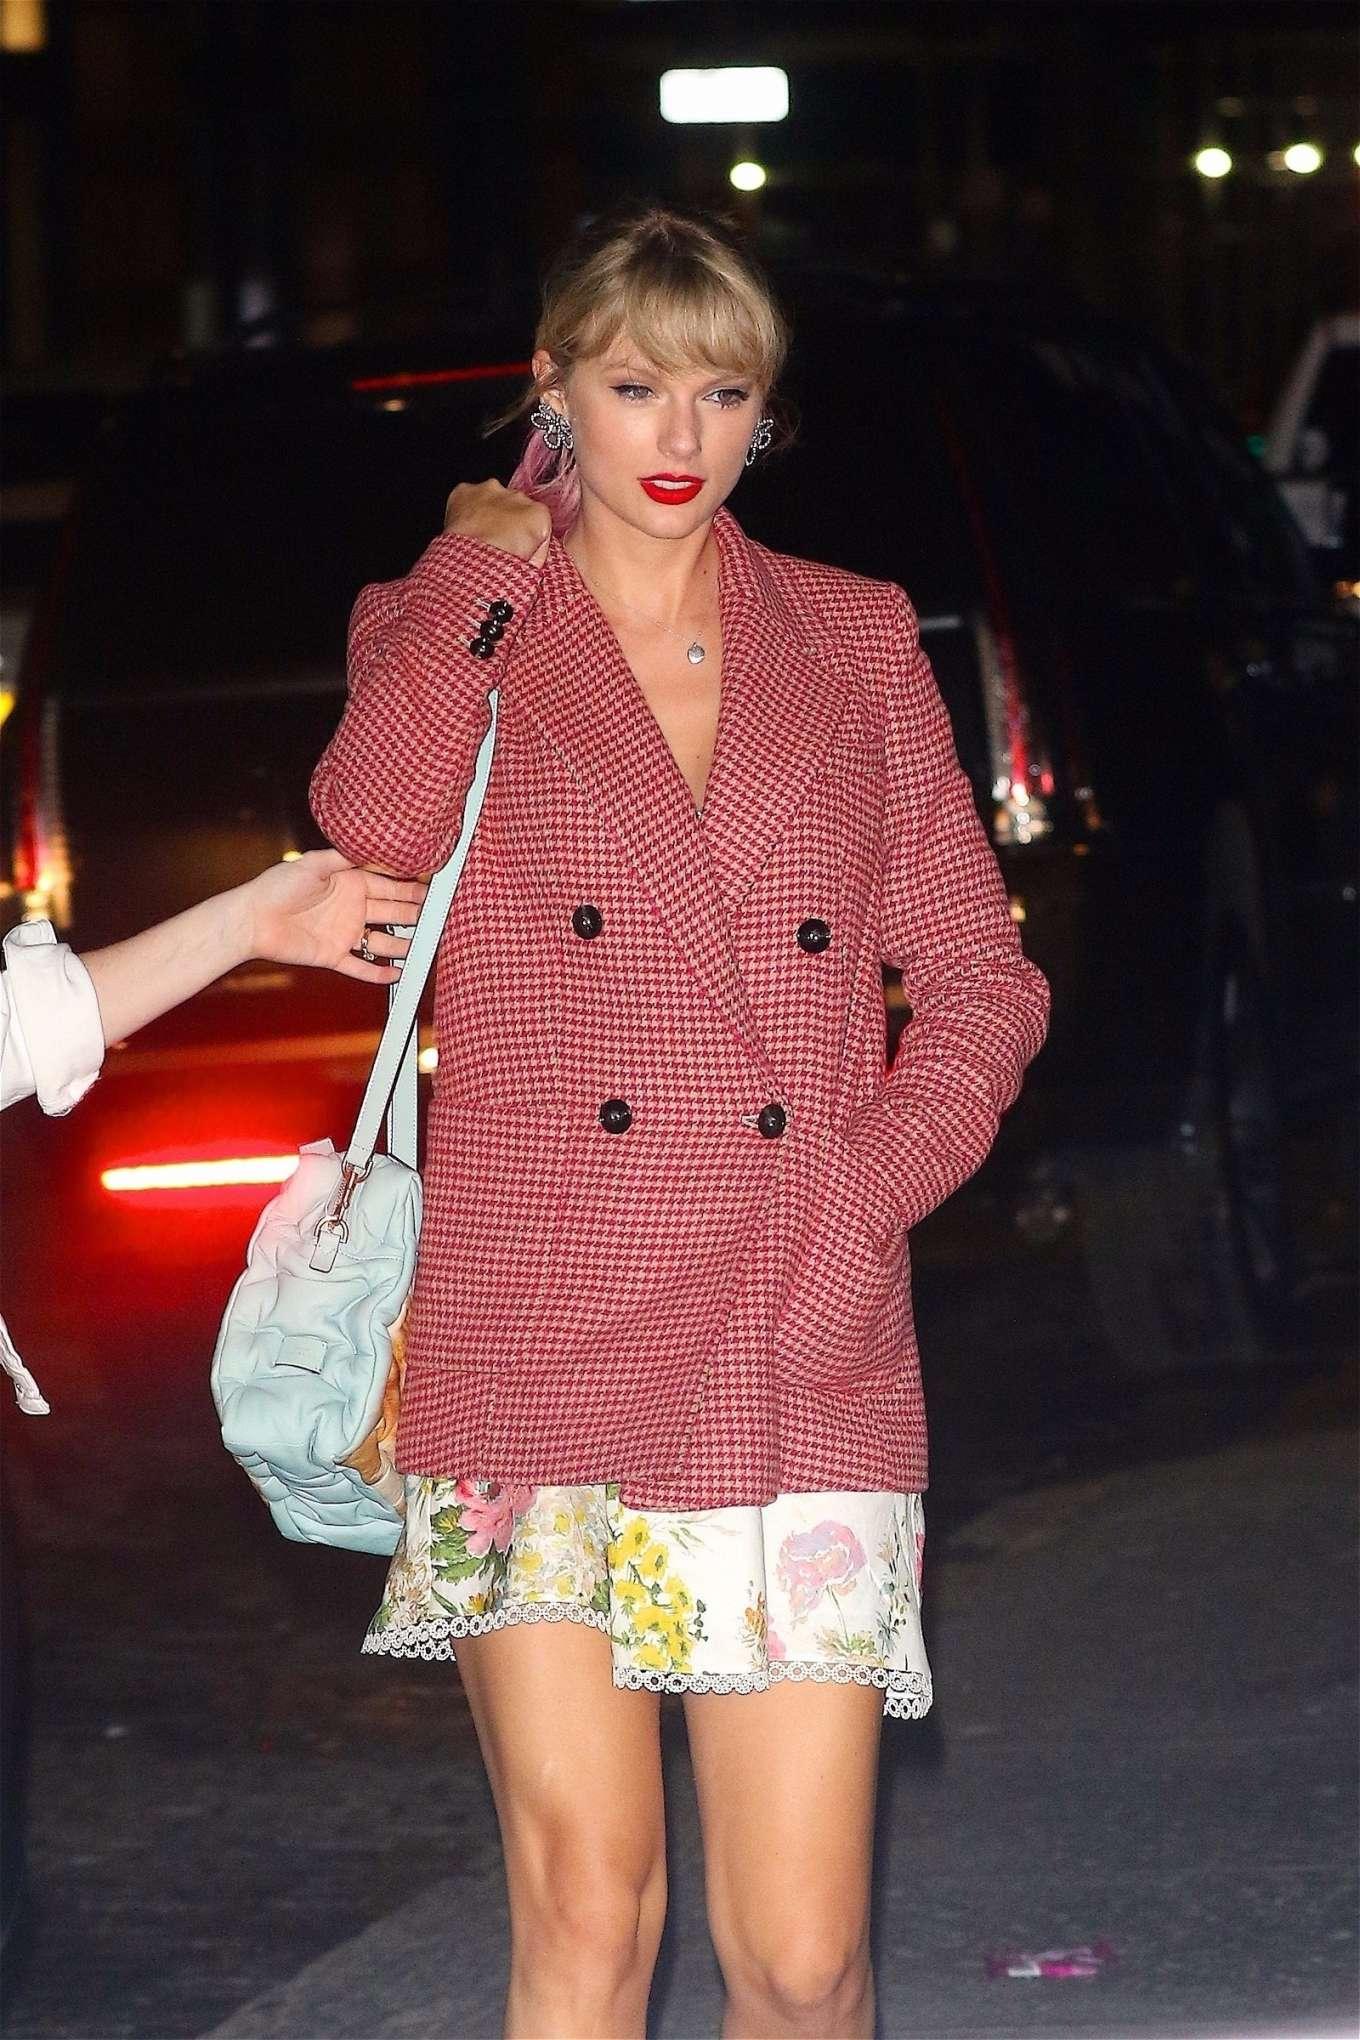 Taylor Swift - Returns home from Gigi Hadid's birthday in New York